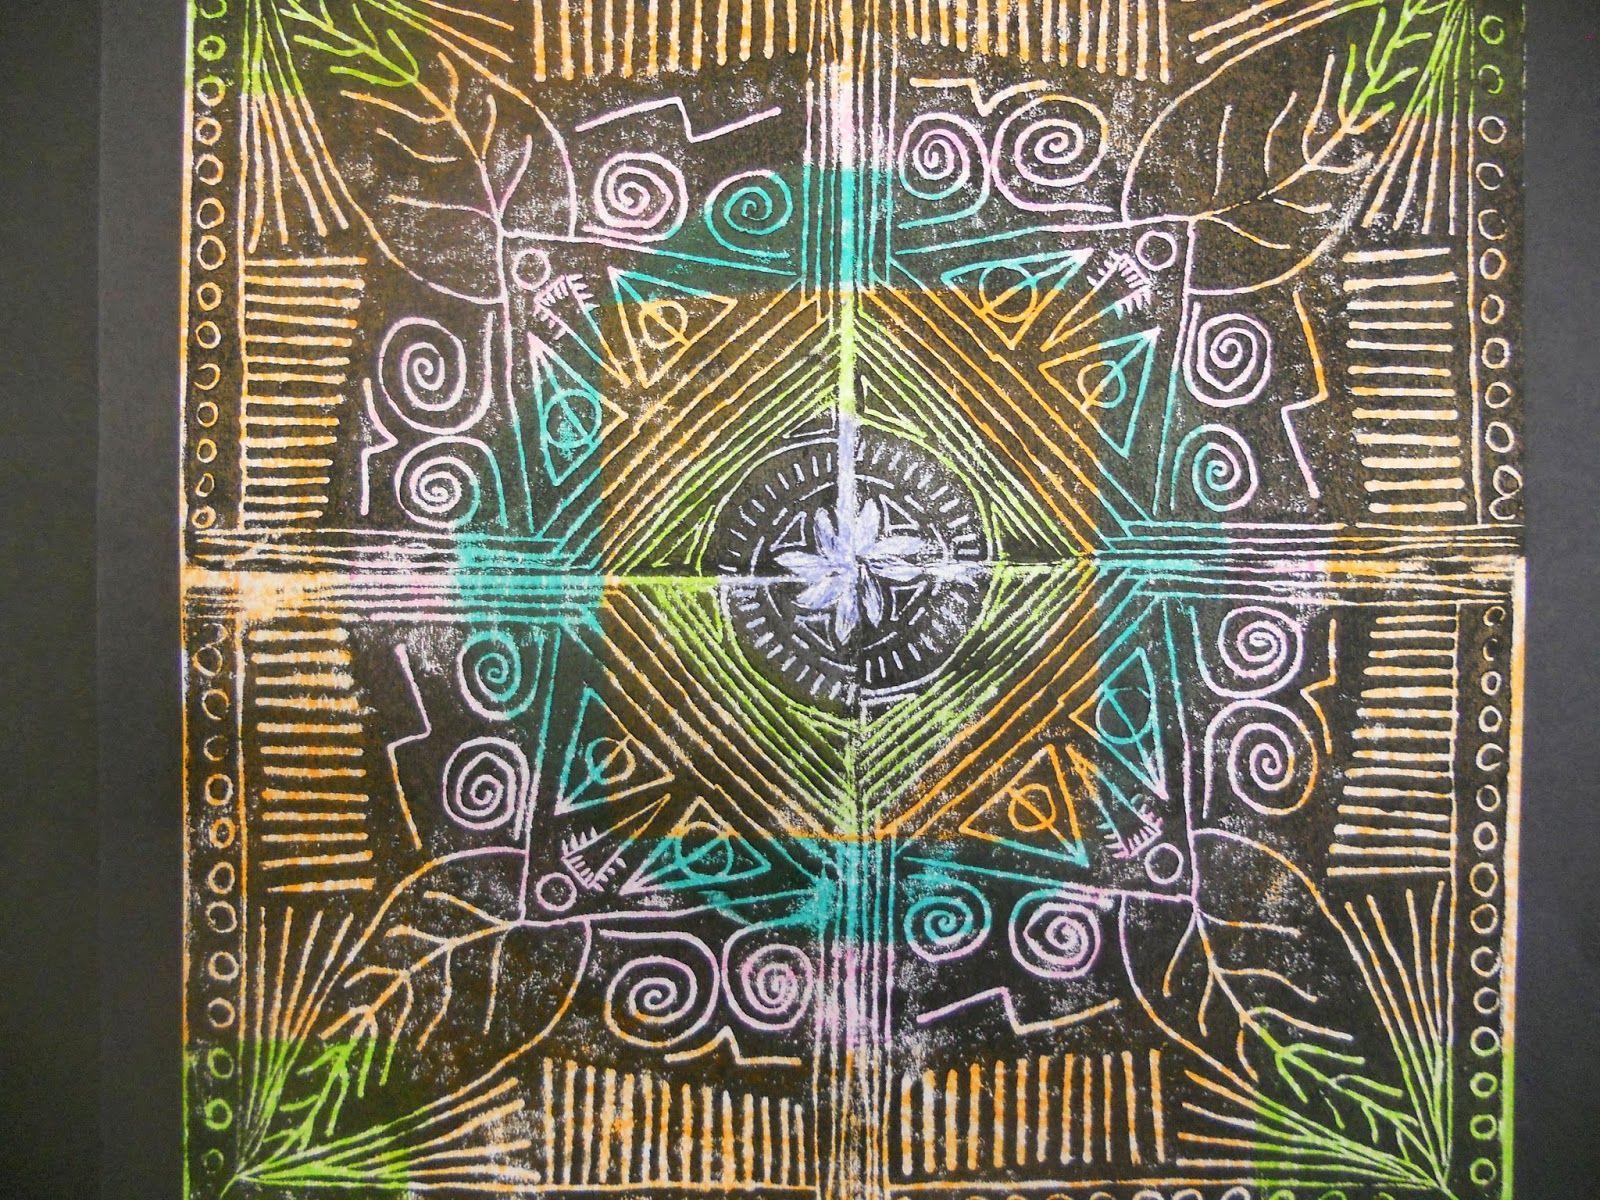 5th Grade Rotational Symmetry Printmaking